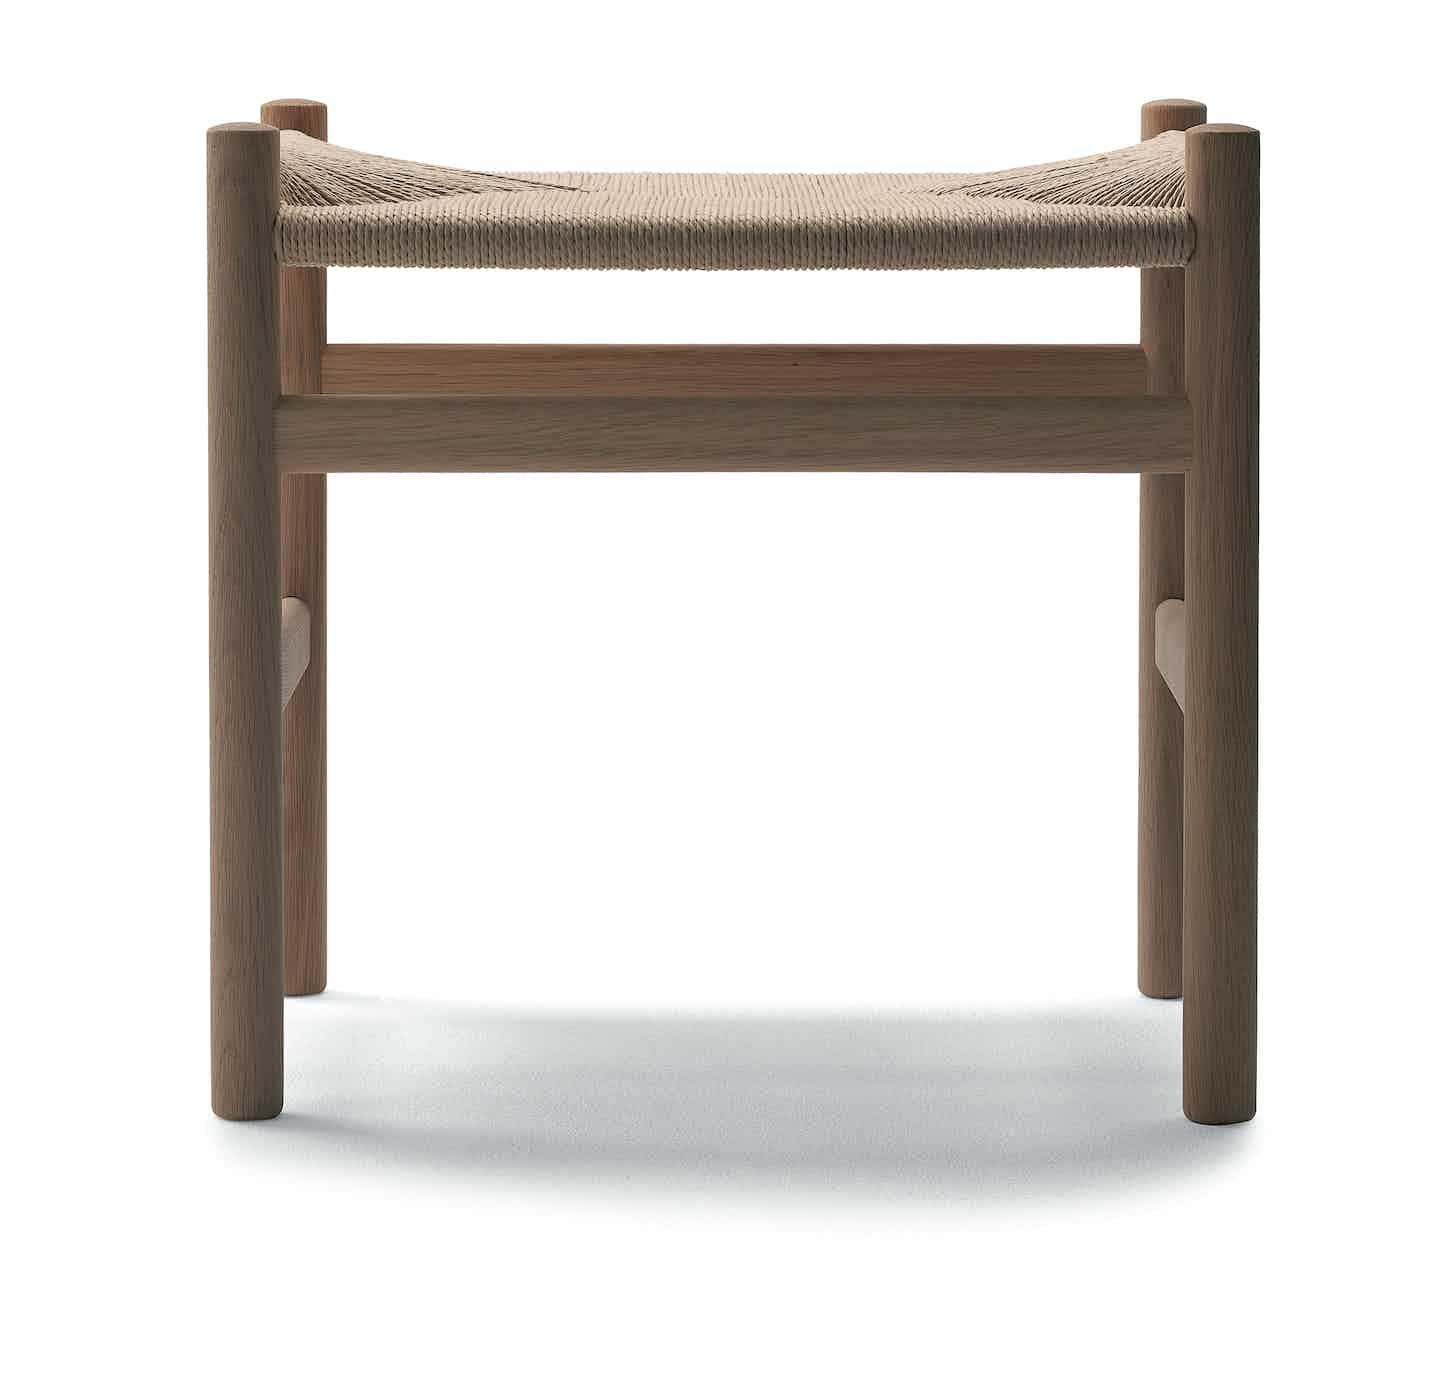 Carl-hansen-son-stool-ch53-haute-living